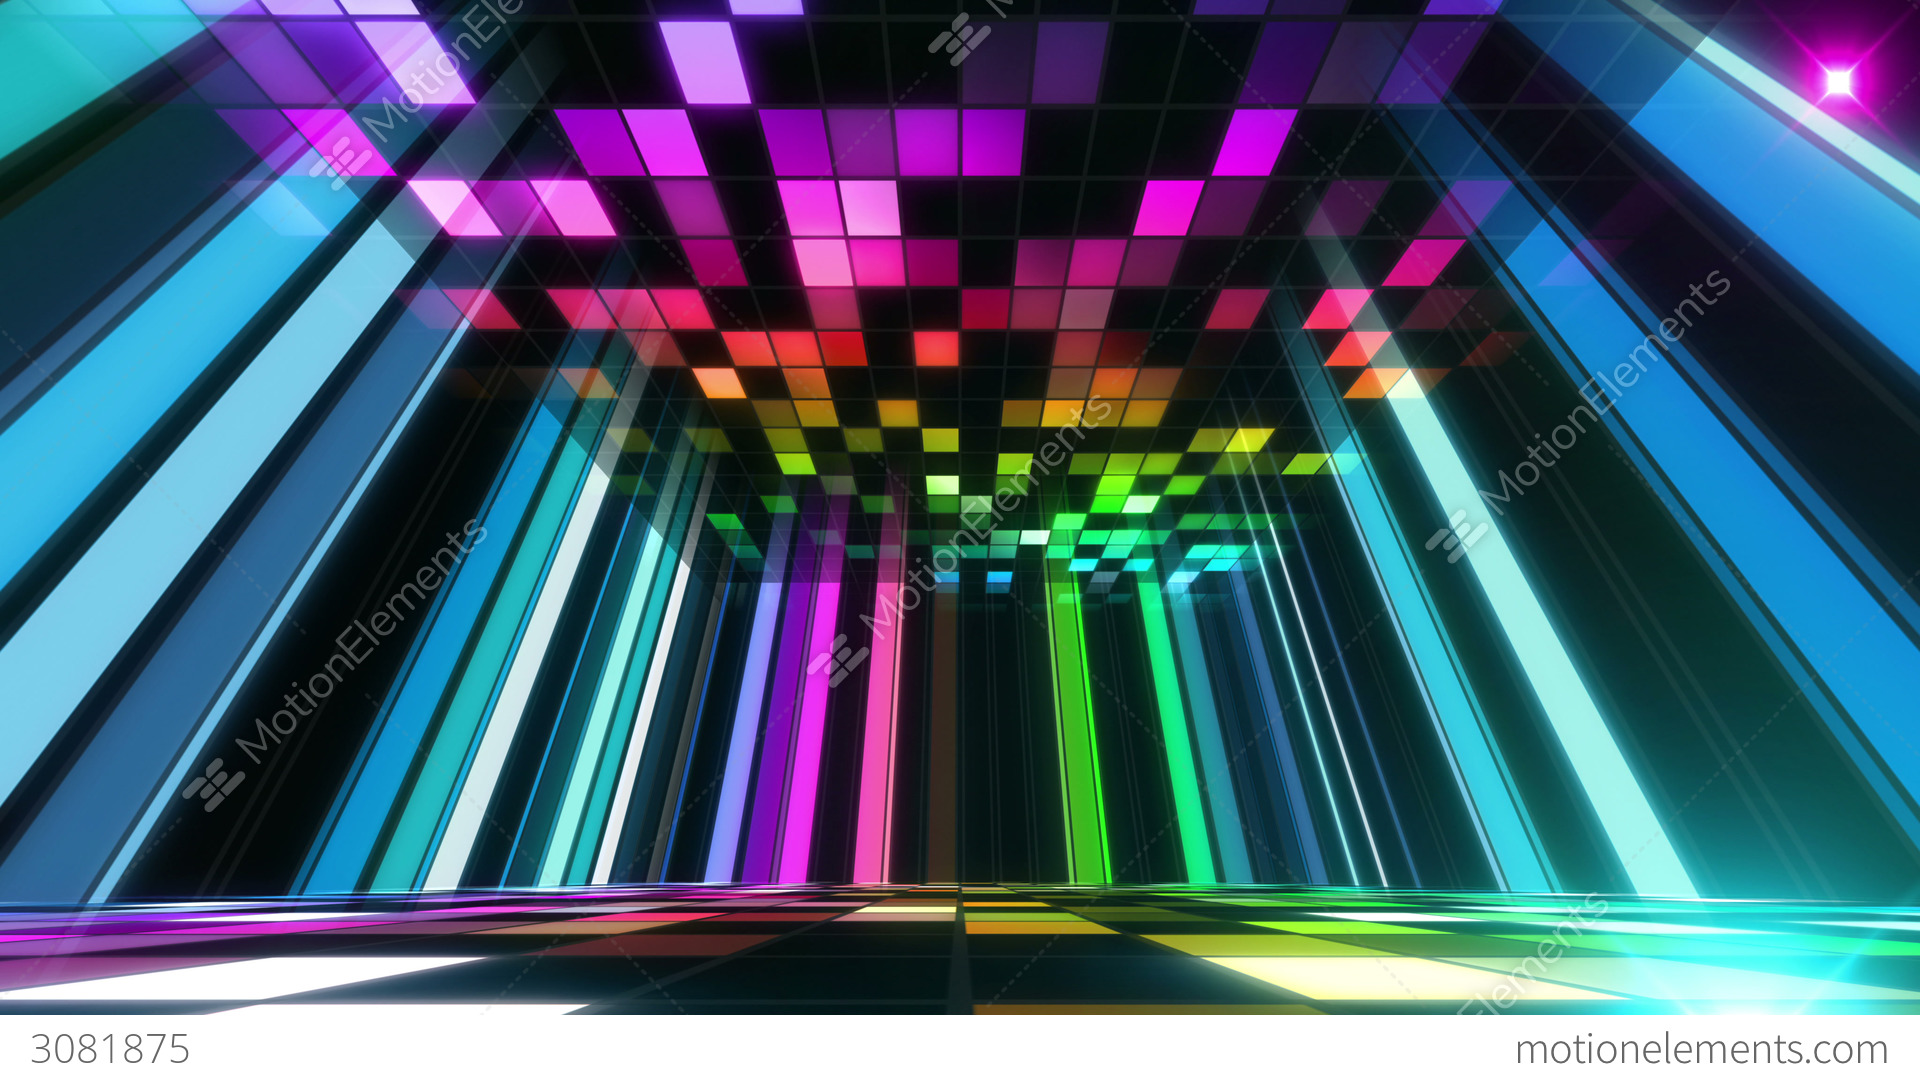 Disco dance floor room b 03f 4k stock animation 3081875 for 123 get on the dance floor song download